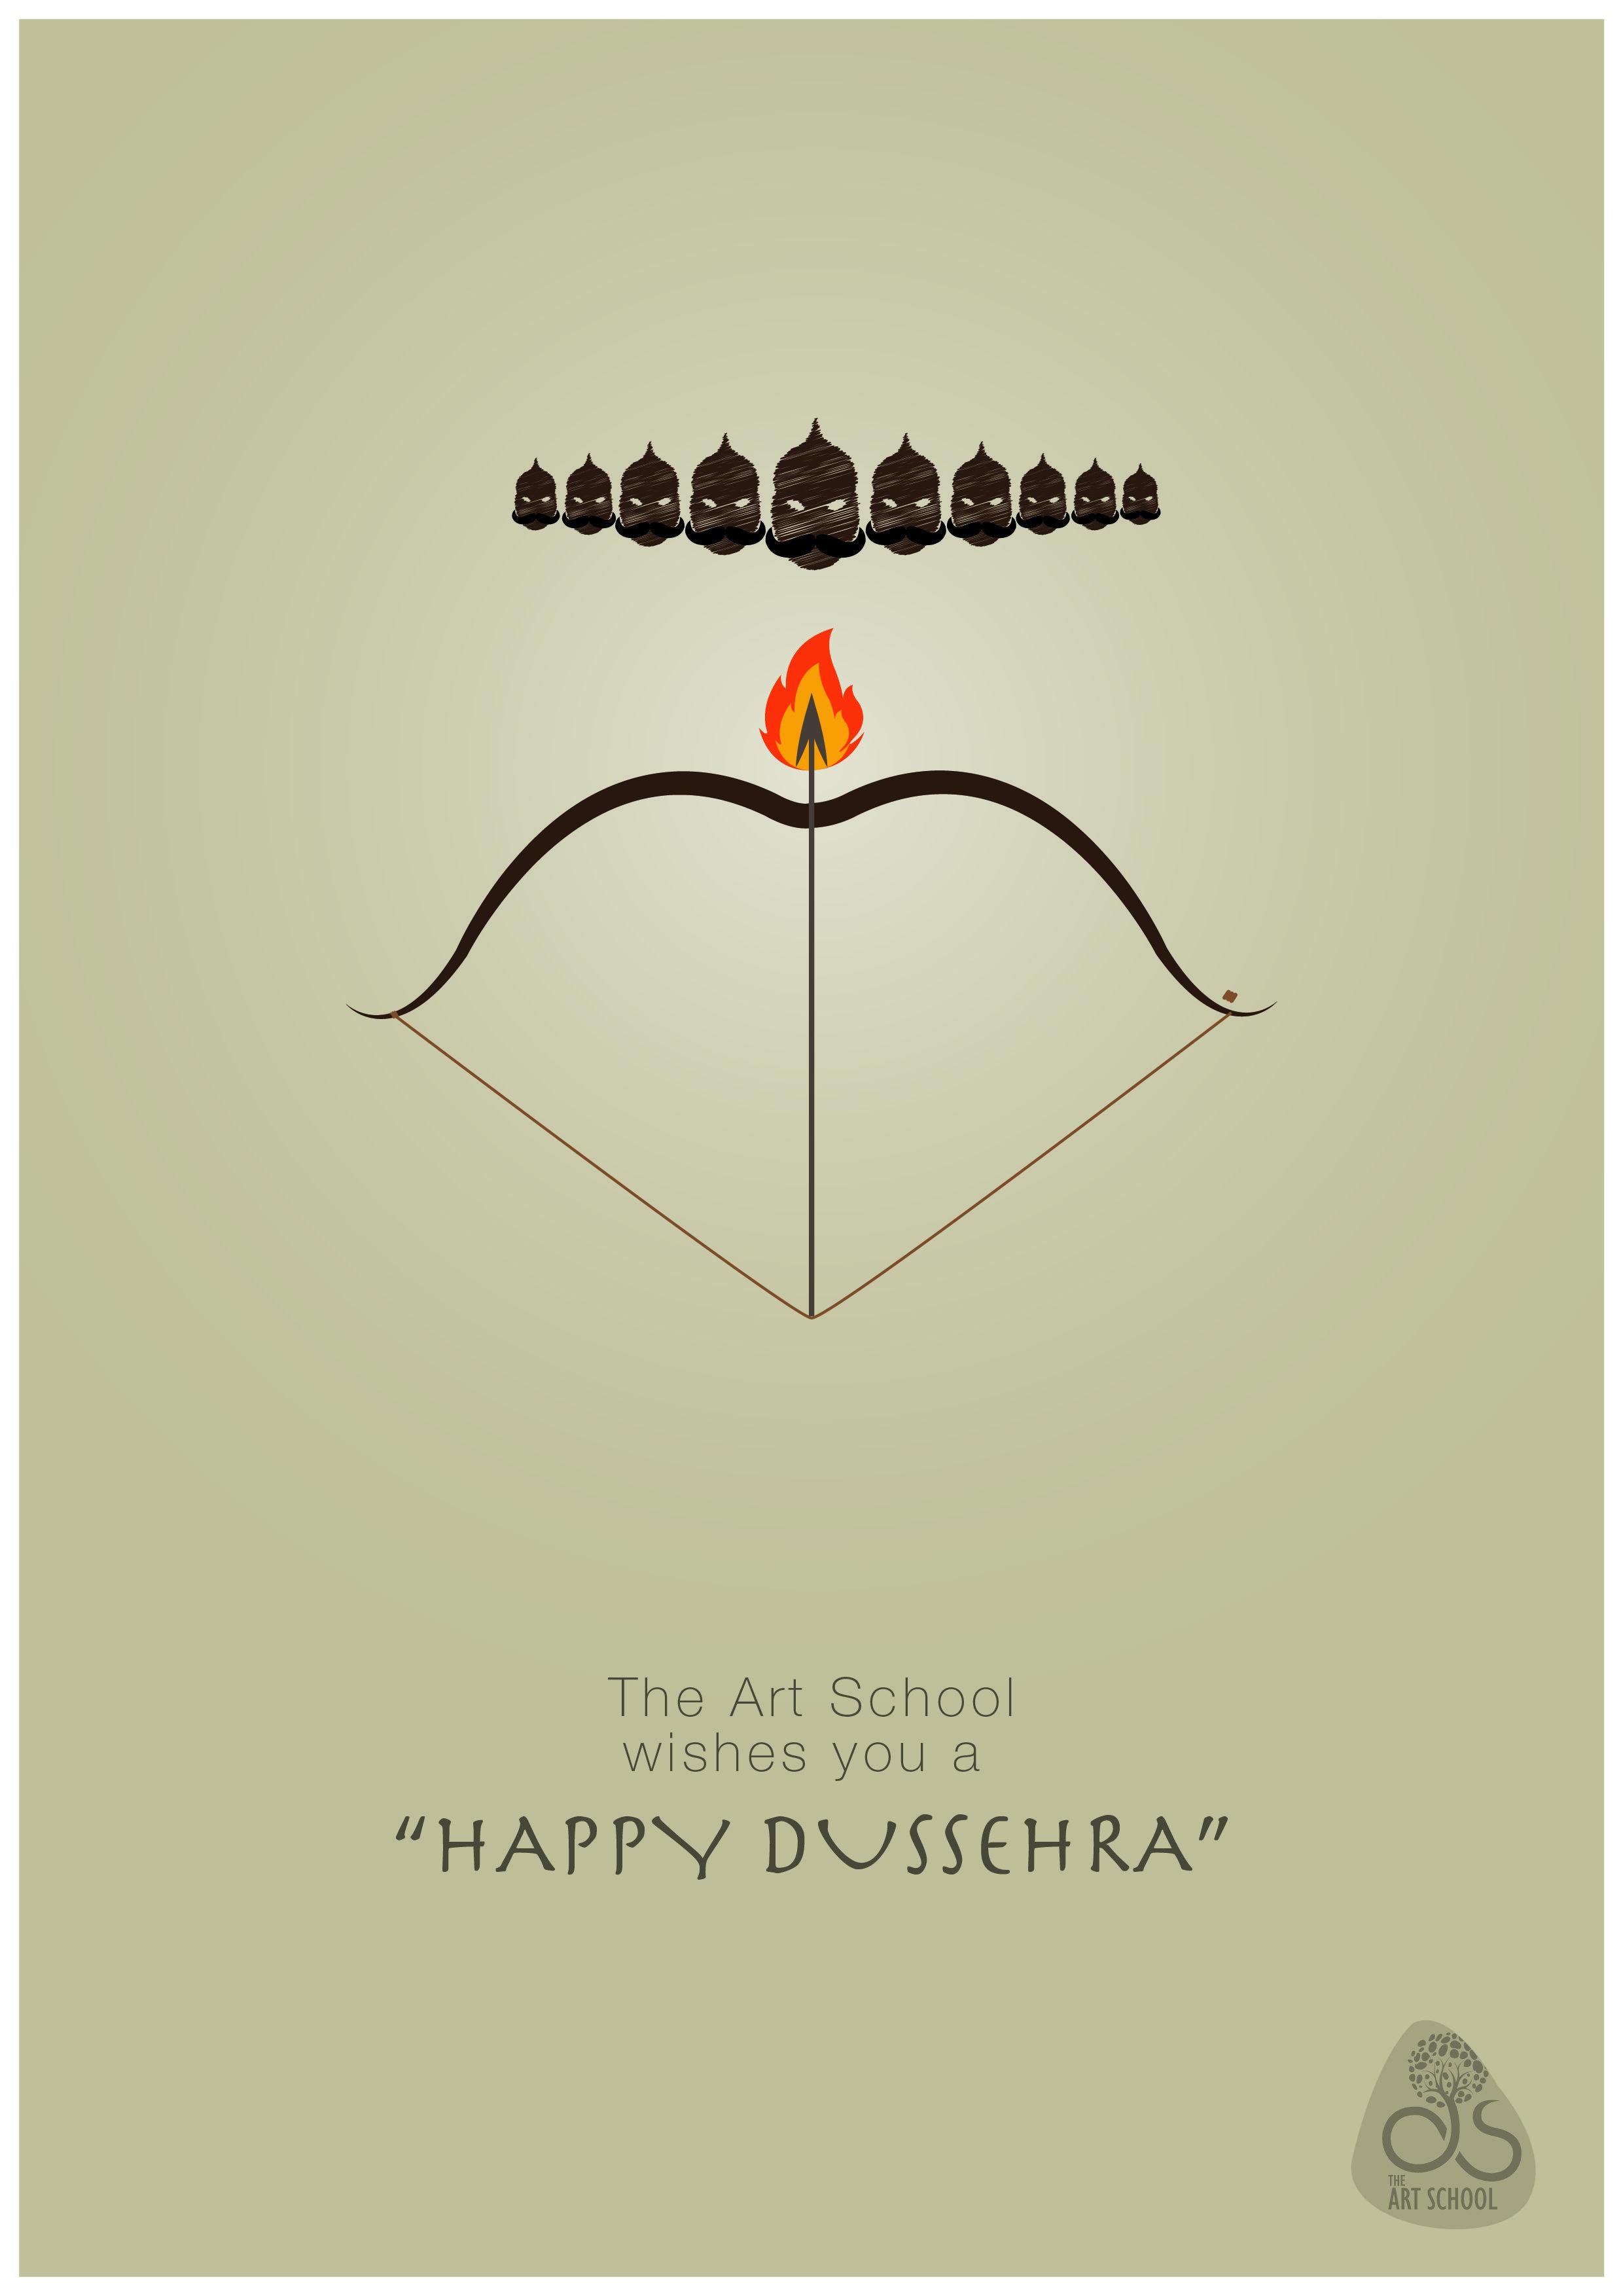 marathi essay on dussehra An essay on dussehra in english dilip thakur dussehra wishes in marathi, lines on dussehra festival, dussehra messages essay | निबन्ध.